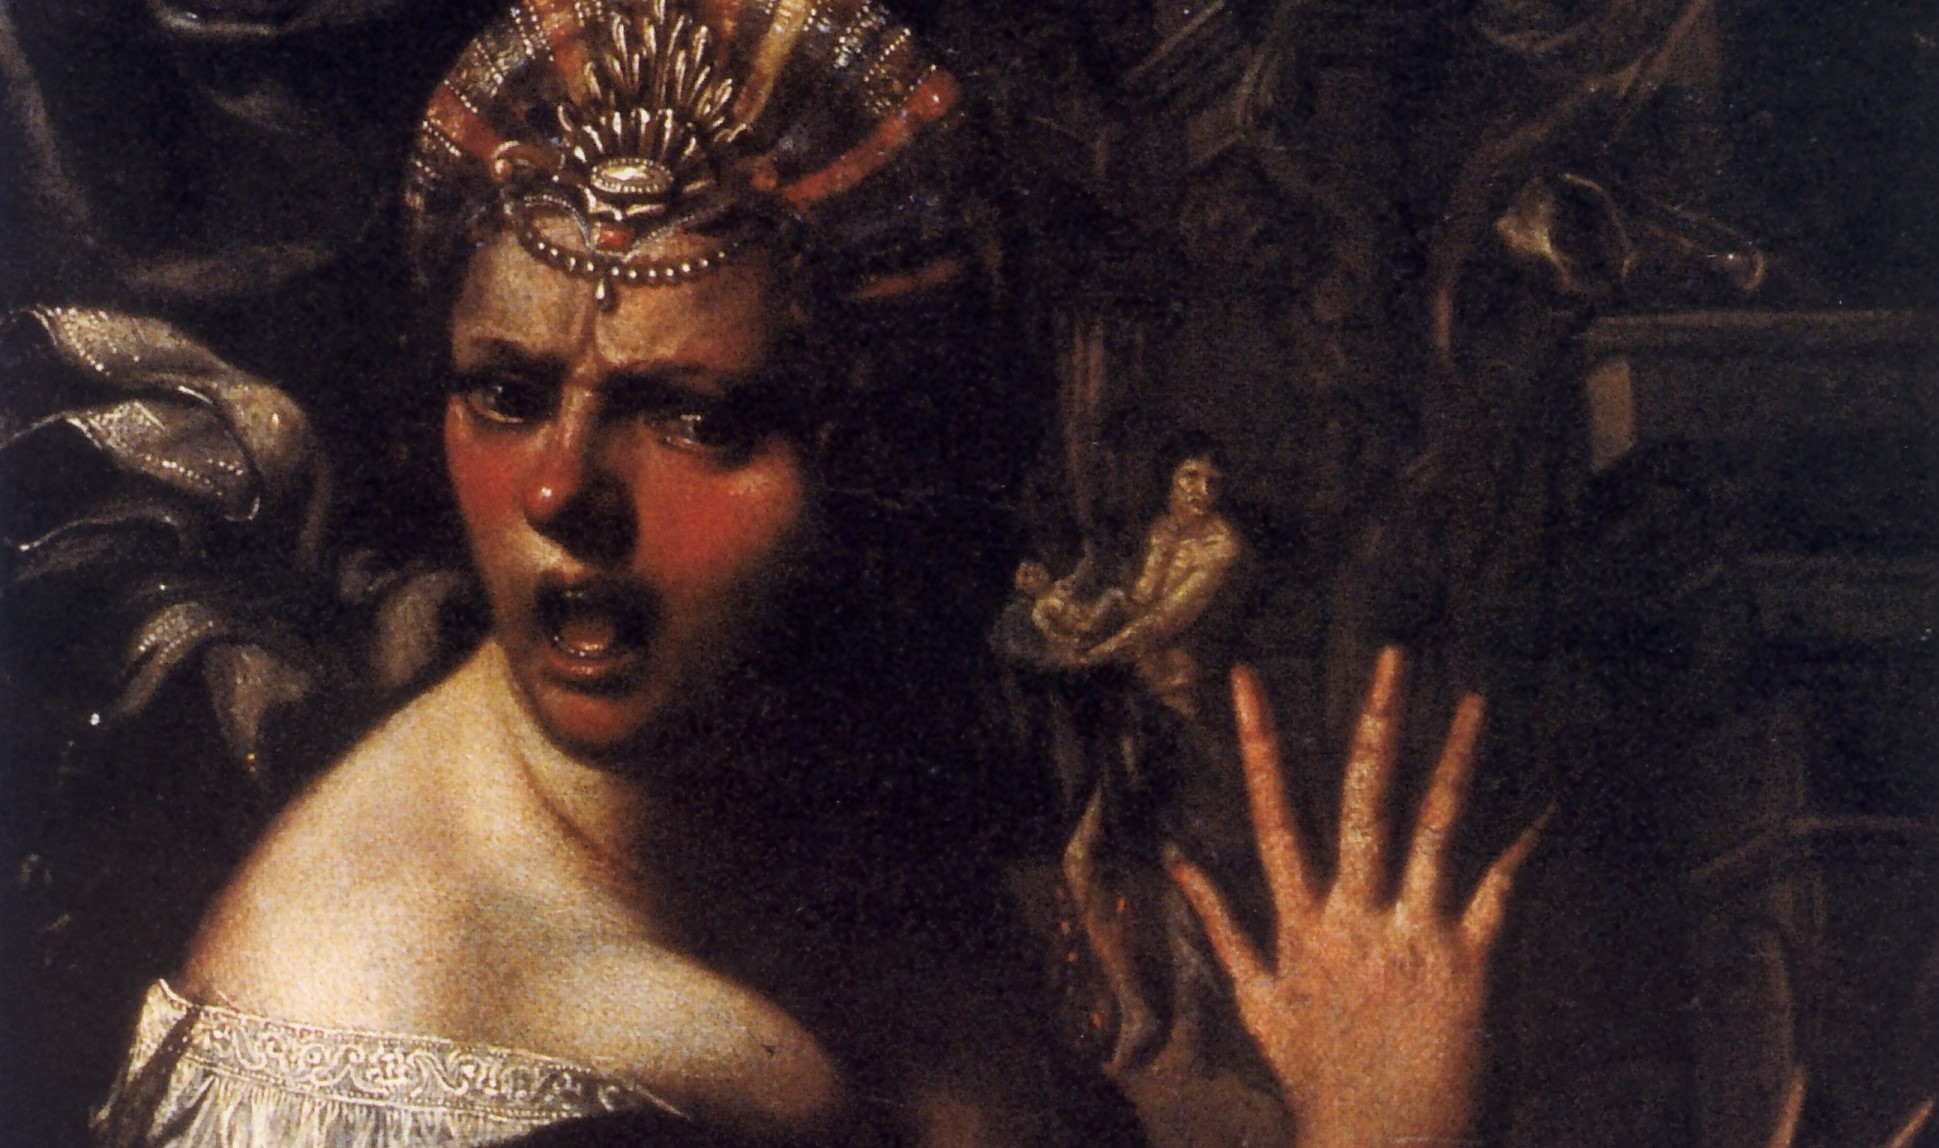 angelo caroselli-la negromante (2)